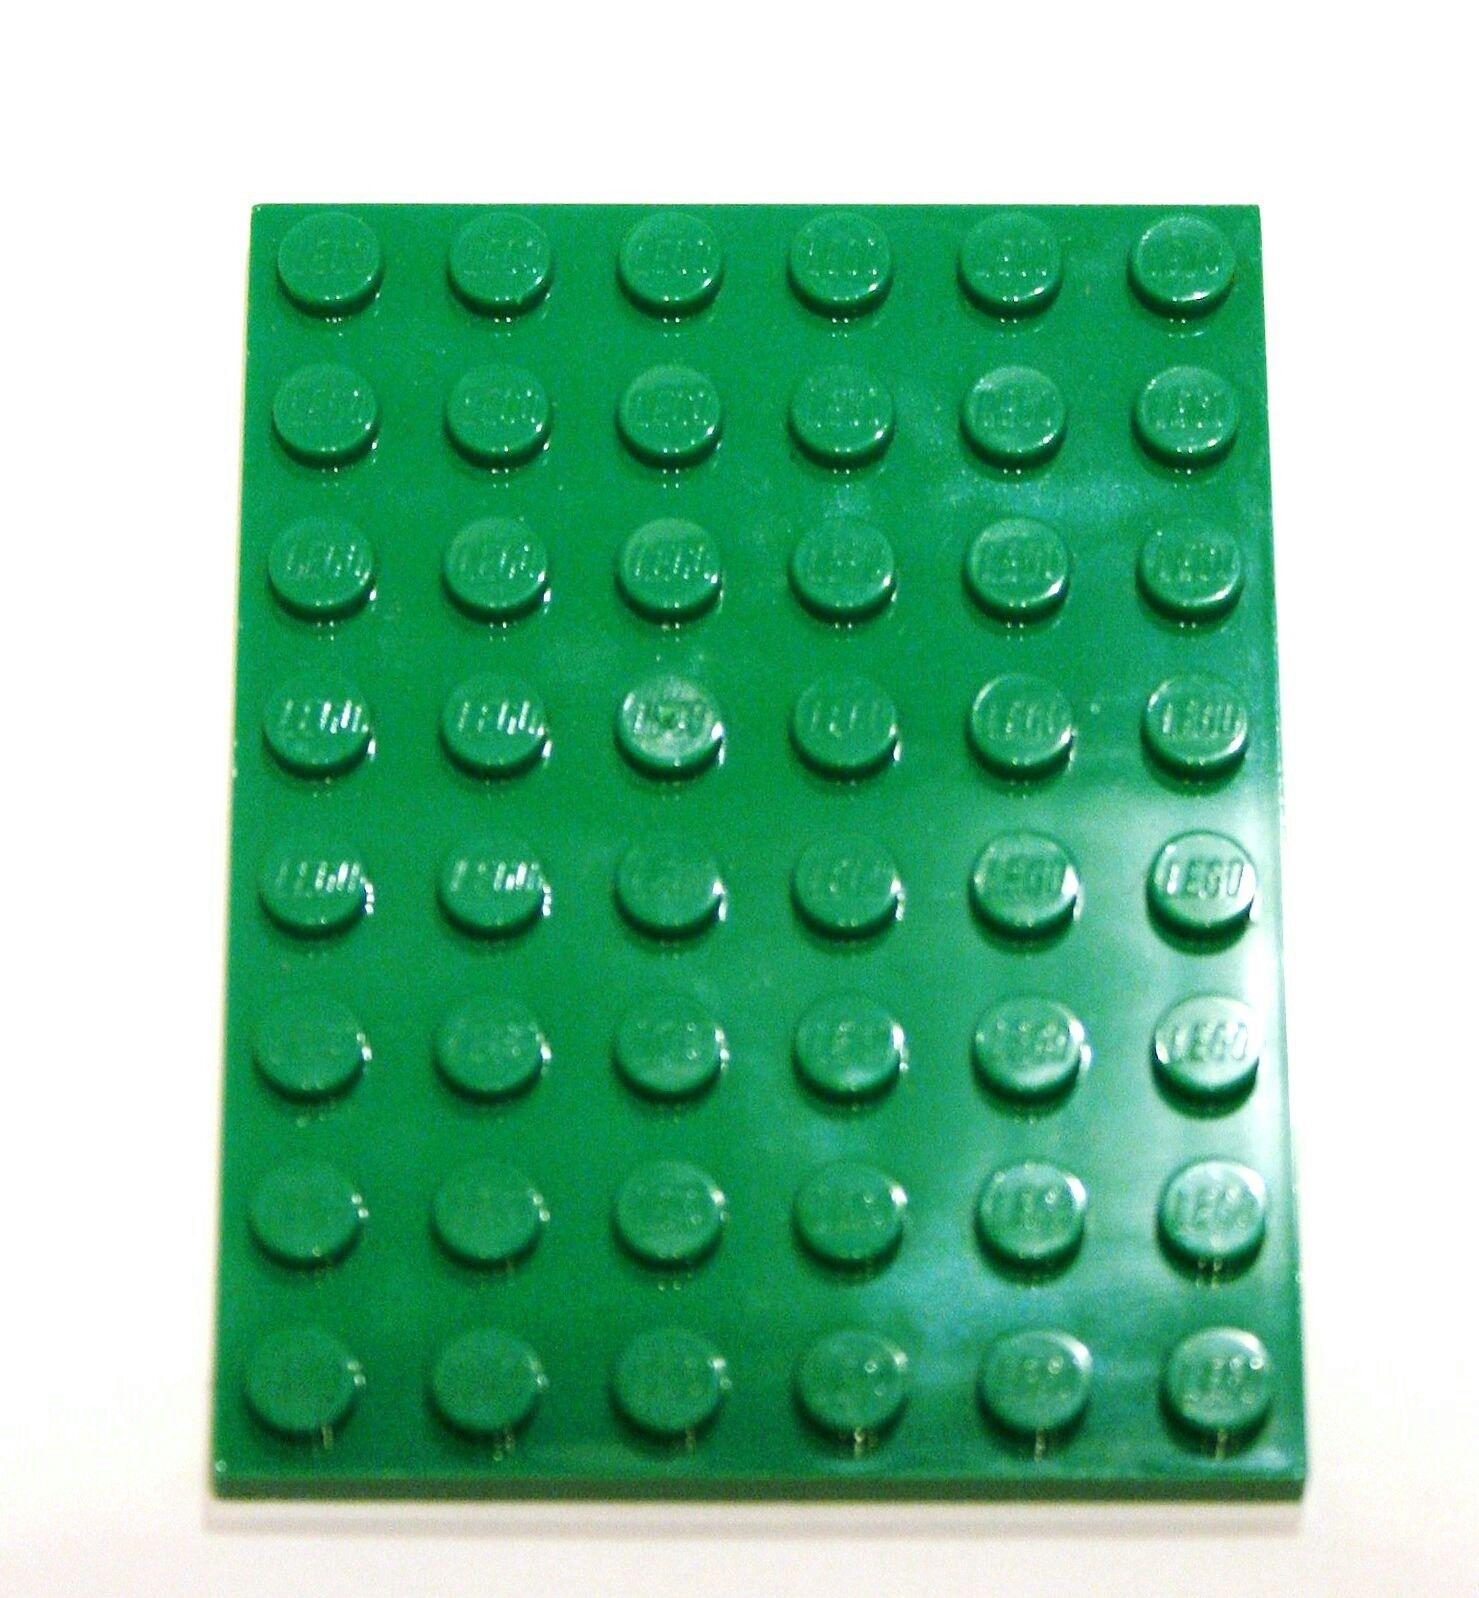 Lego 3x 2348b transDkBlue Scheibe Glas 4560 4561 6350 6561 6562 6337 1-22-1